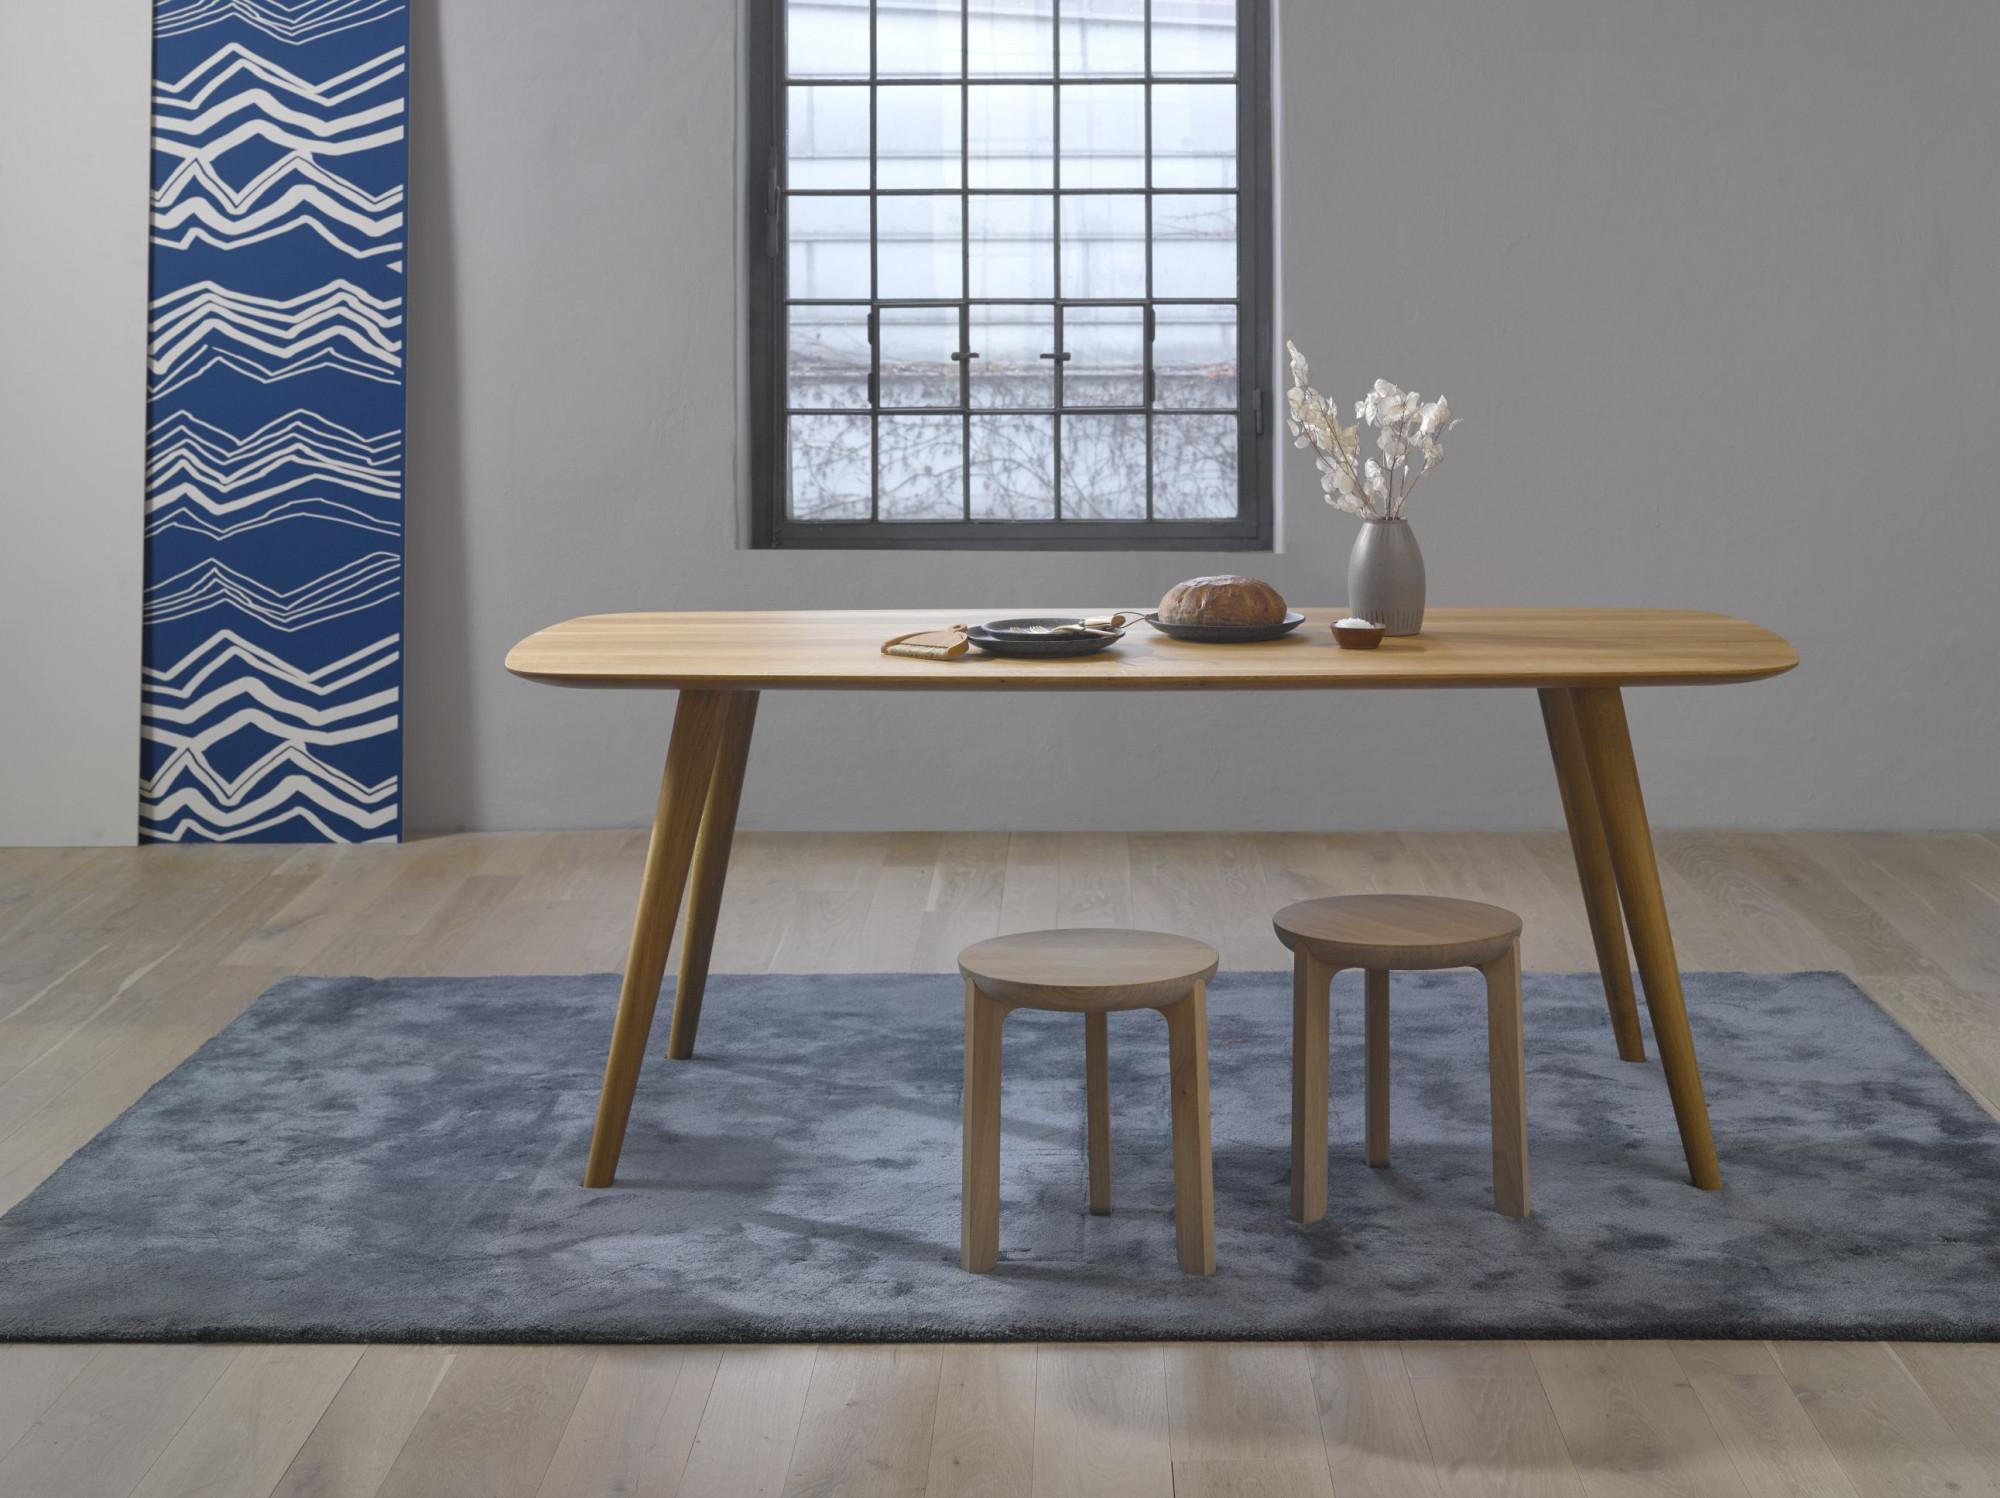 Masívny dubový stôl od firmy Javorina